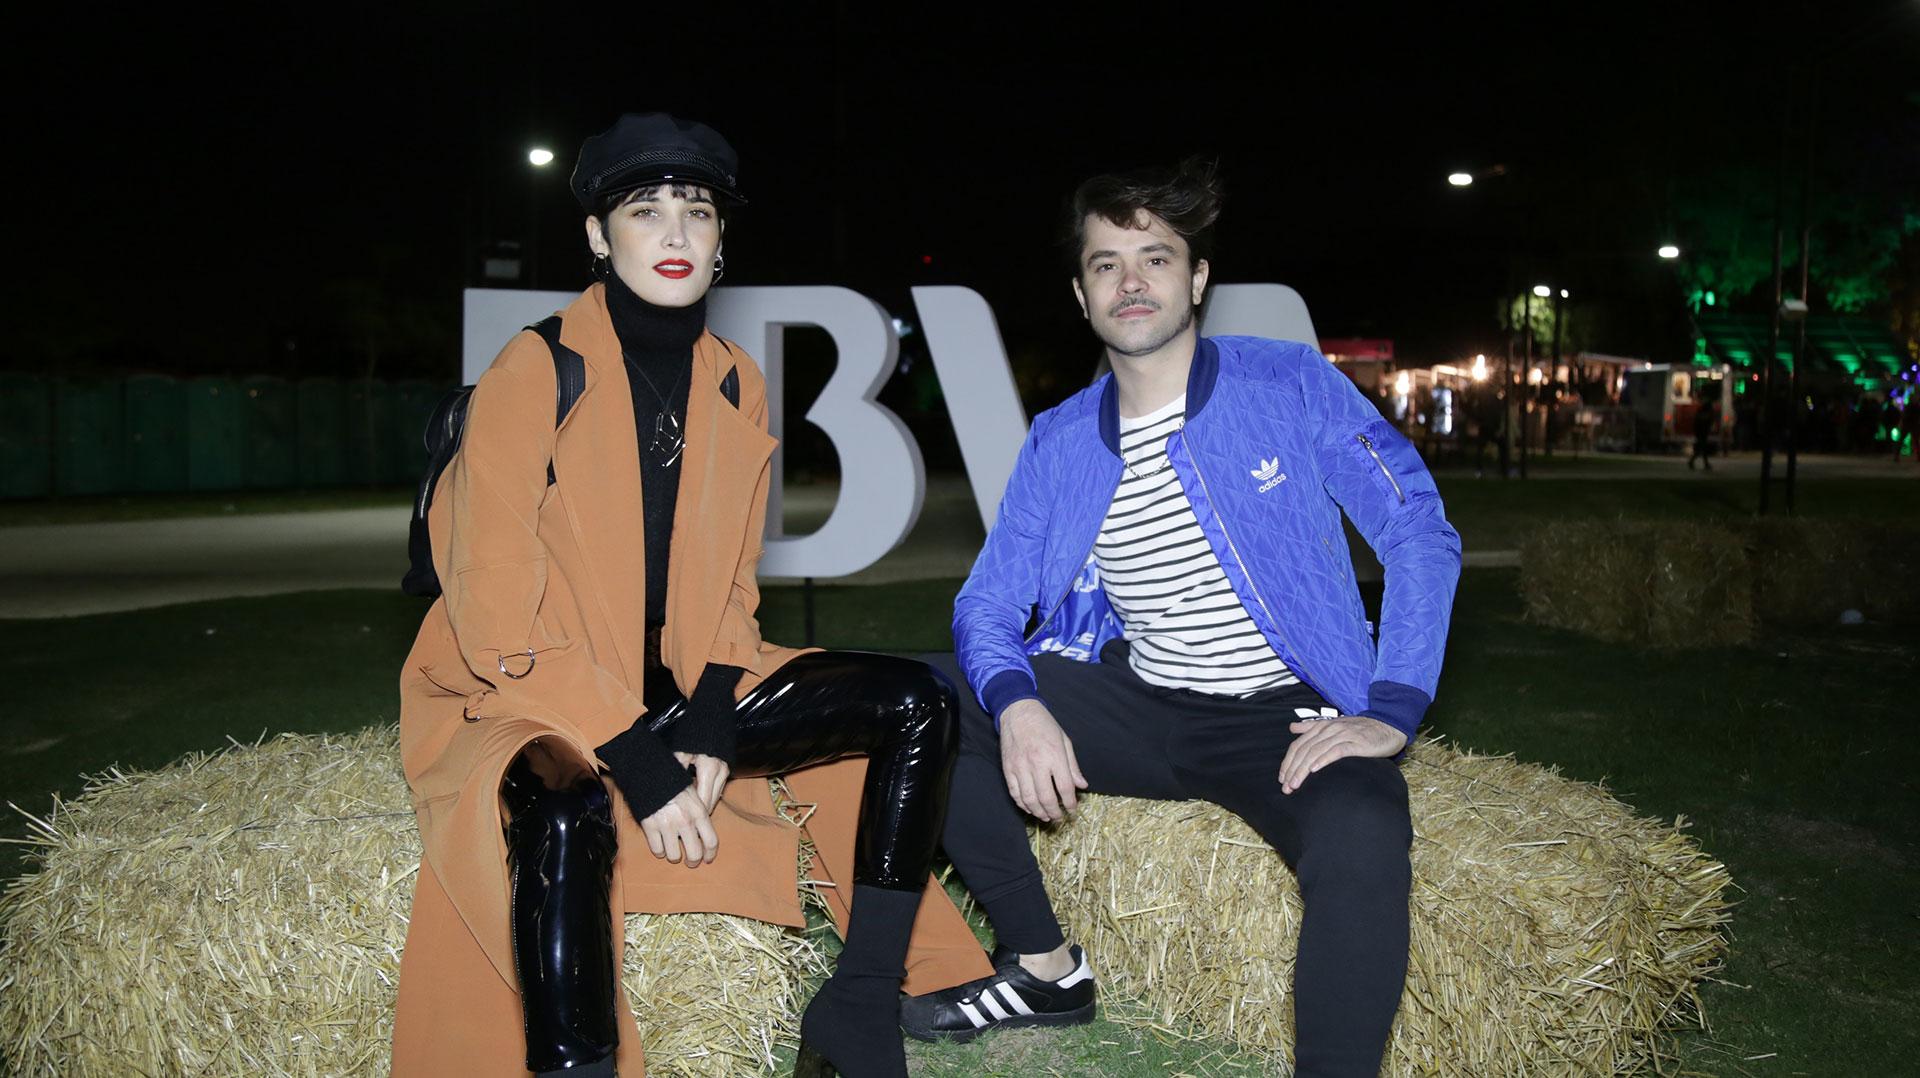 Florencia Torrente y Felipe colombo.